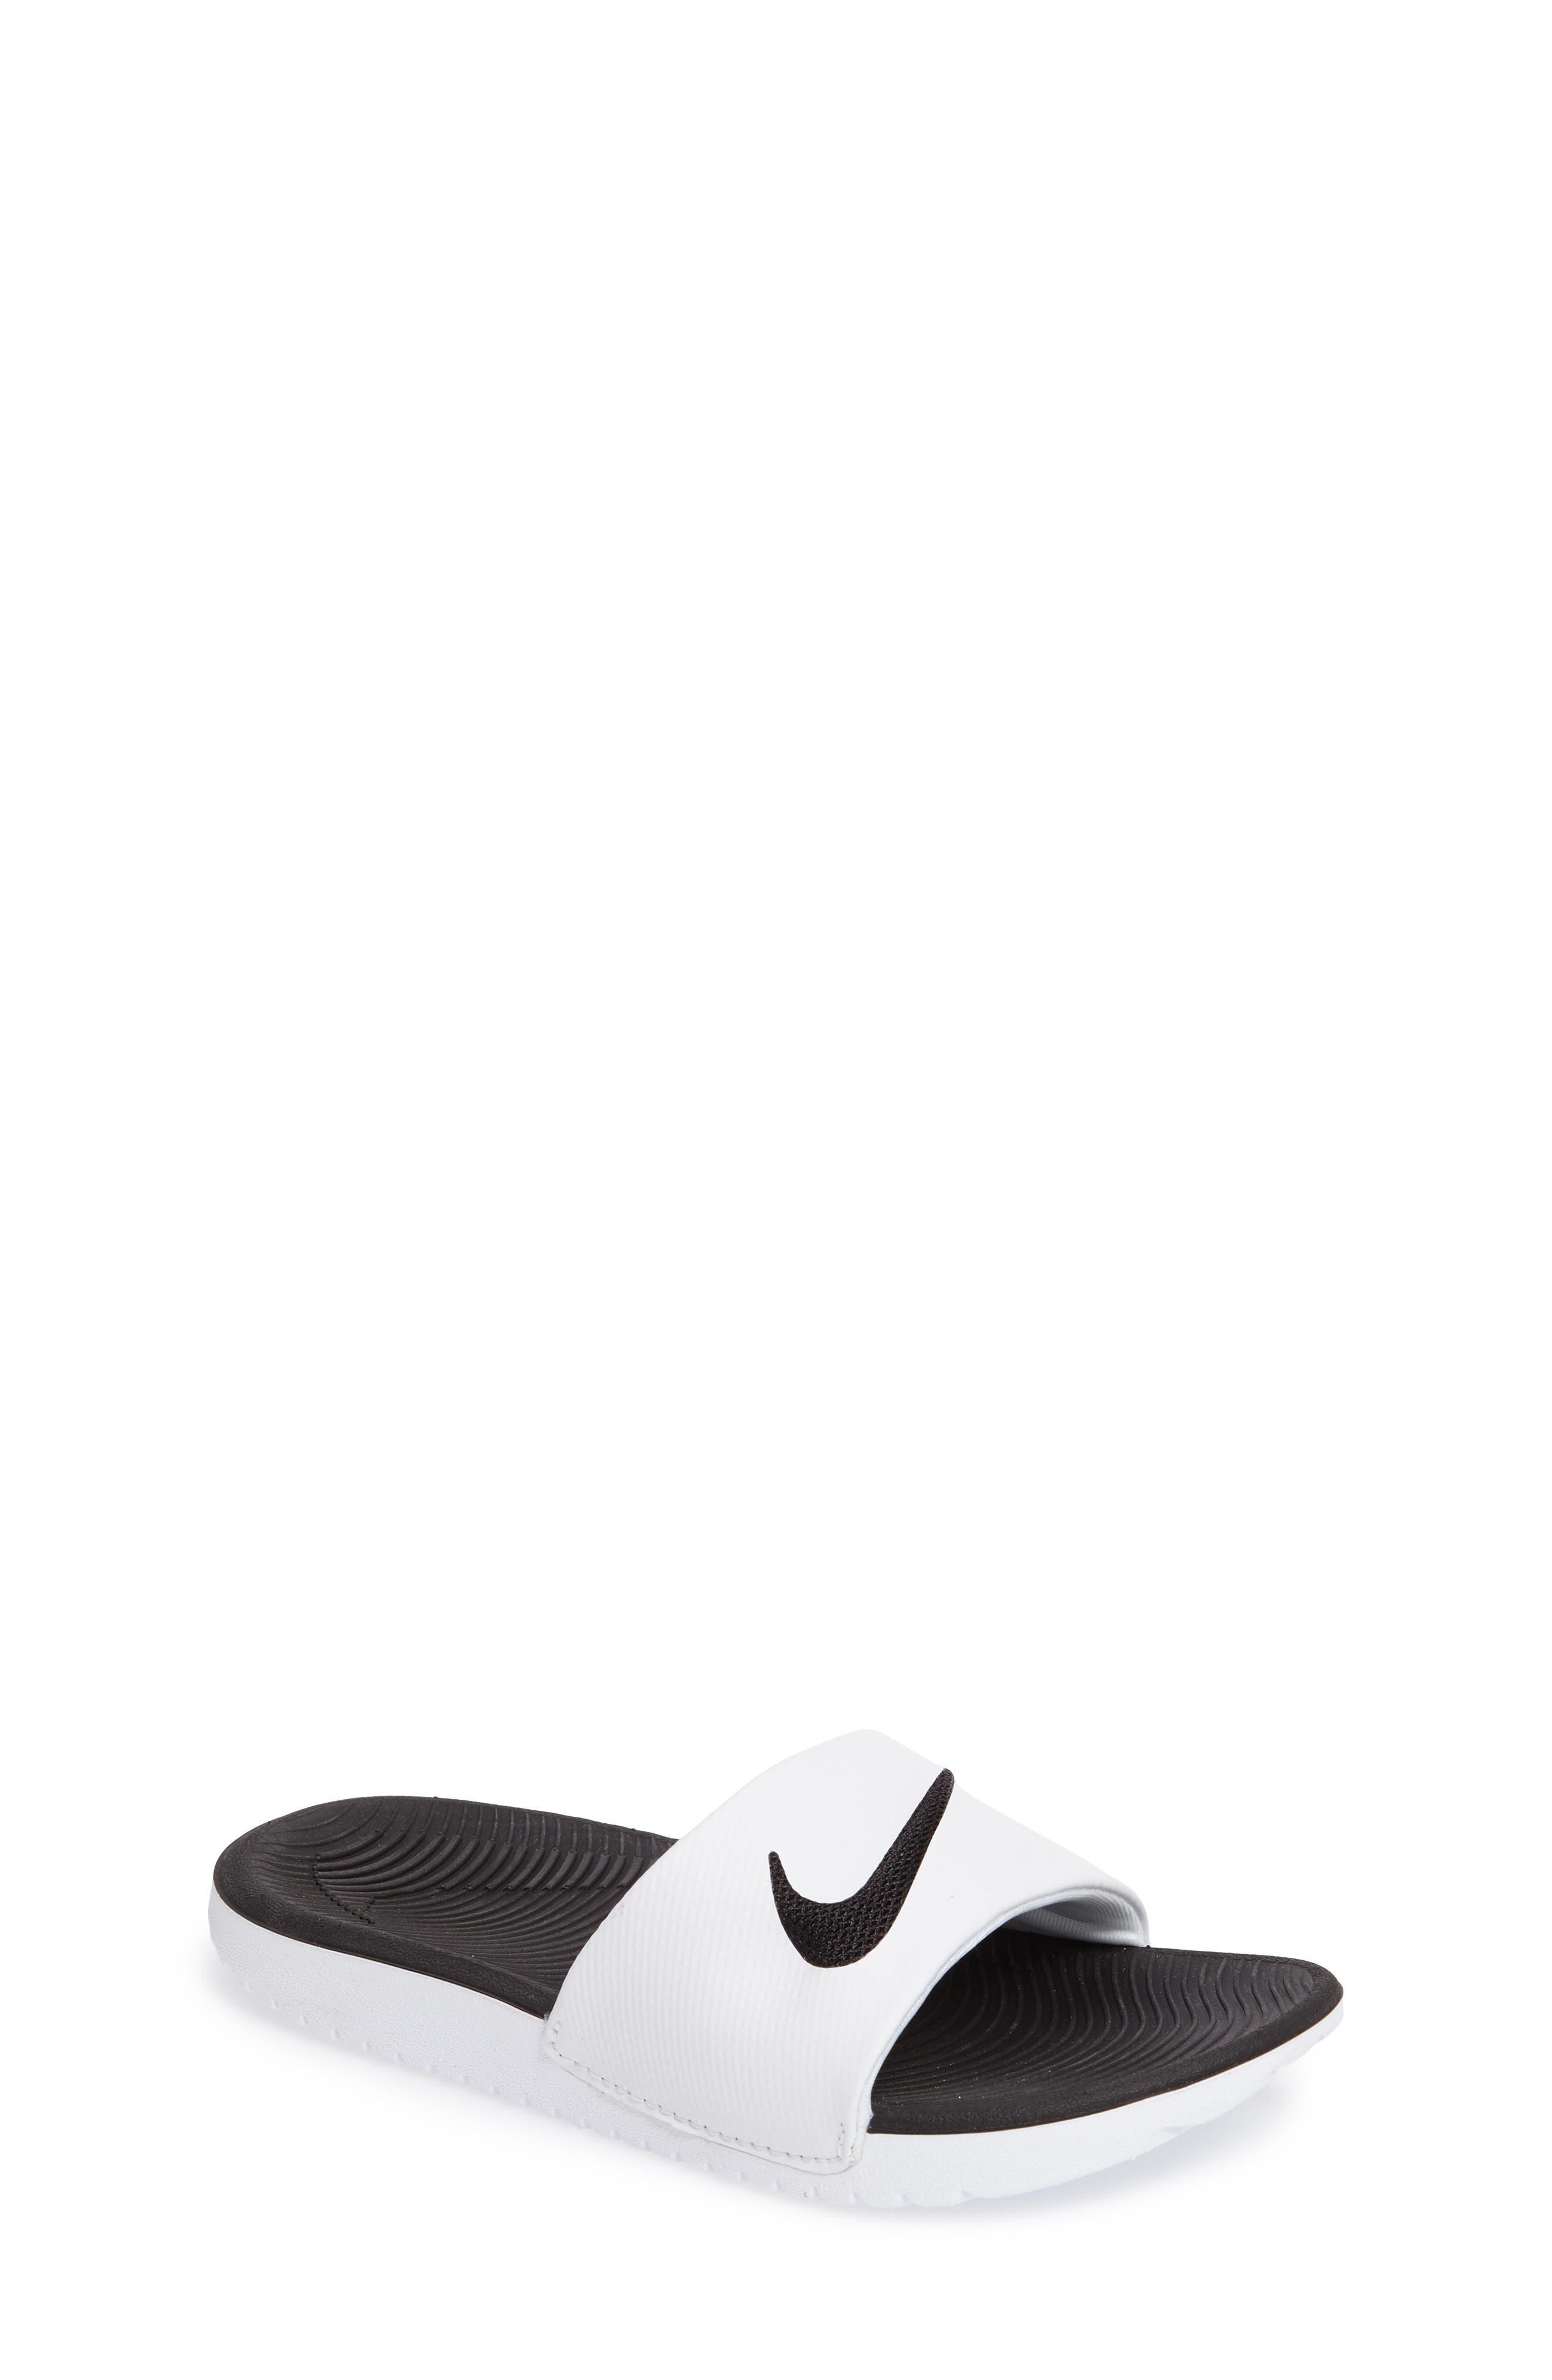 Girls  Nike Sandals   Flip-Flops  fed81f628